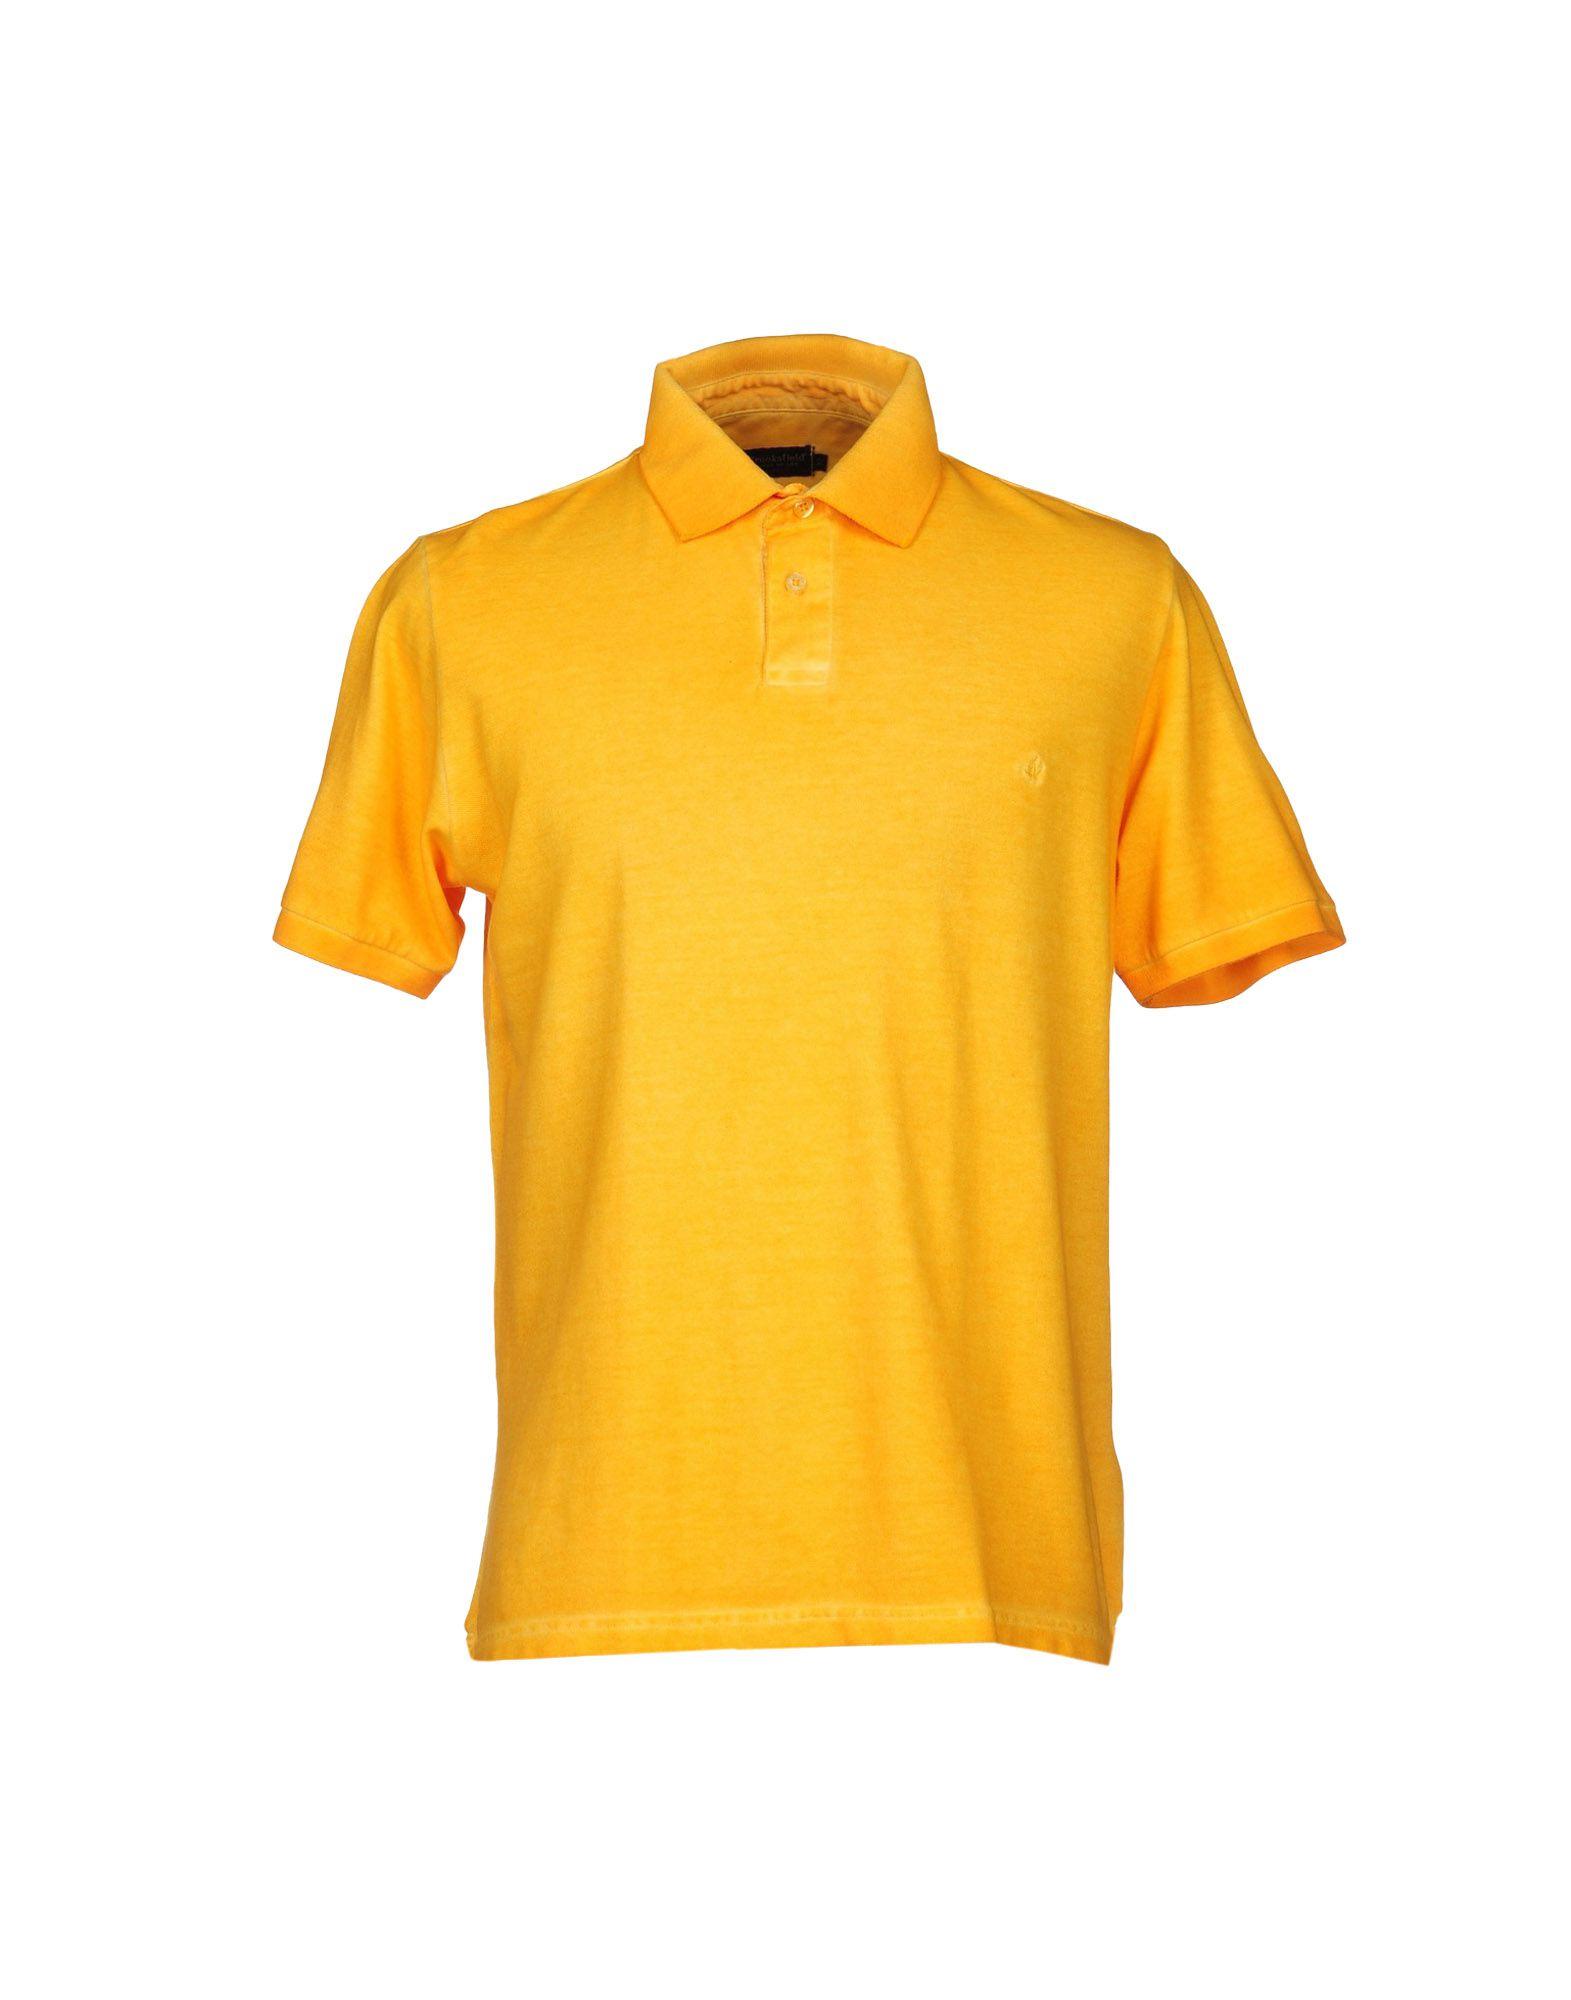 Brooksfield polo shirt in orange for men lyst for Orange polo shirt mens